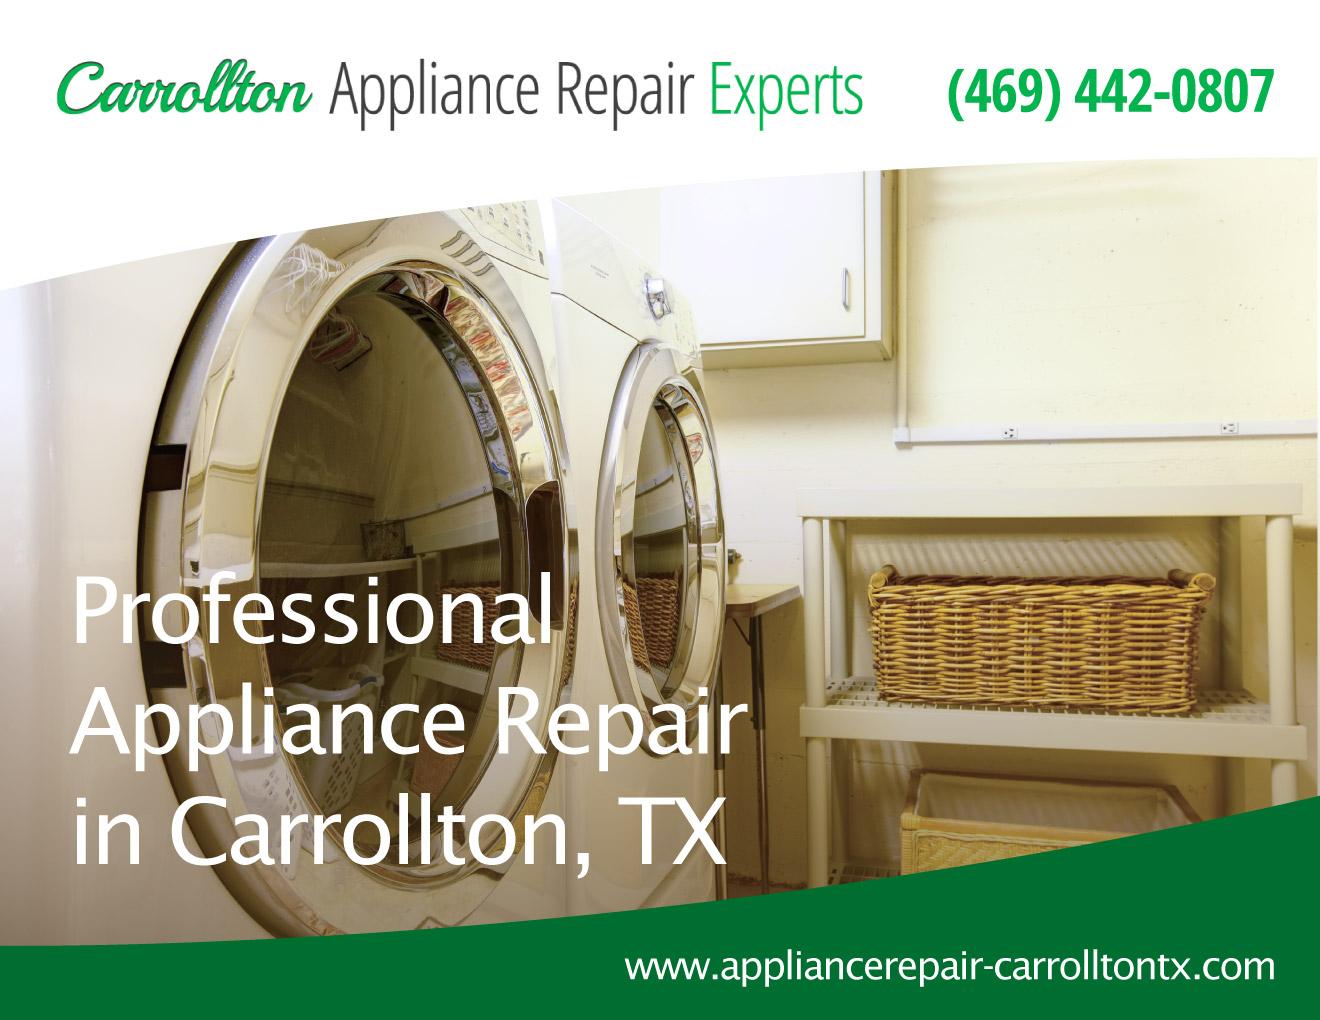 Carrollton Appliance Repair Experts   (469) 442 0807